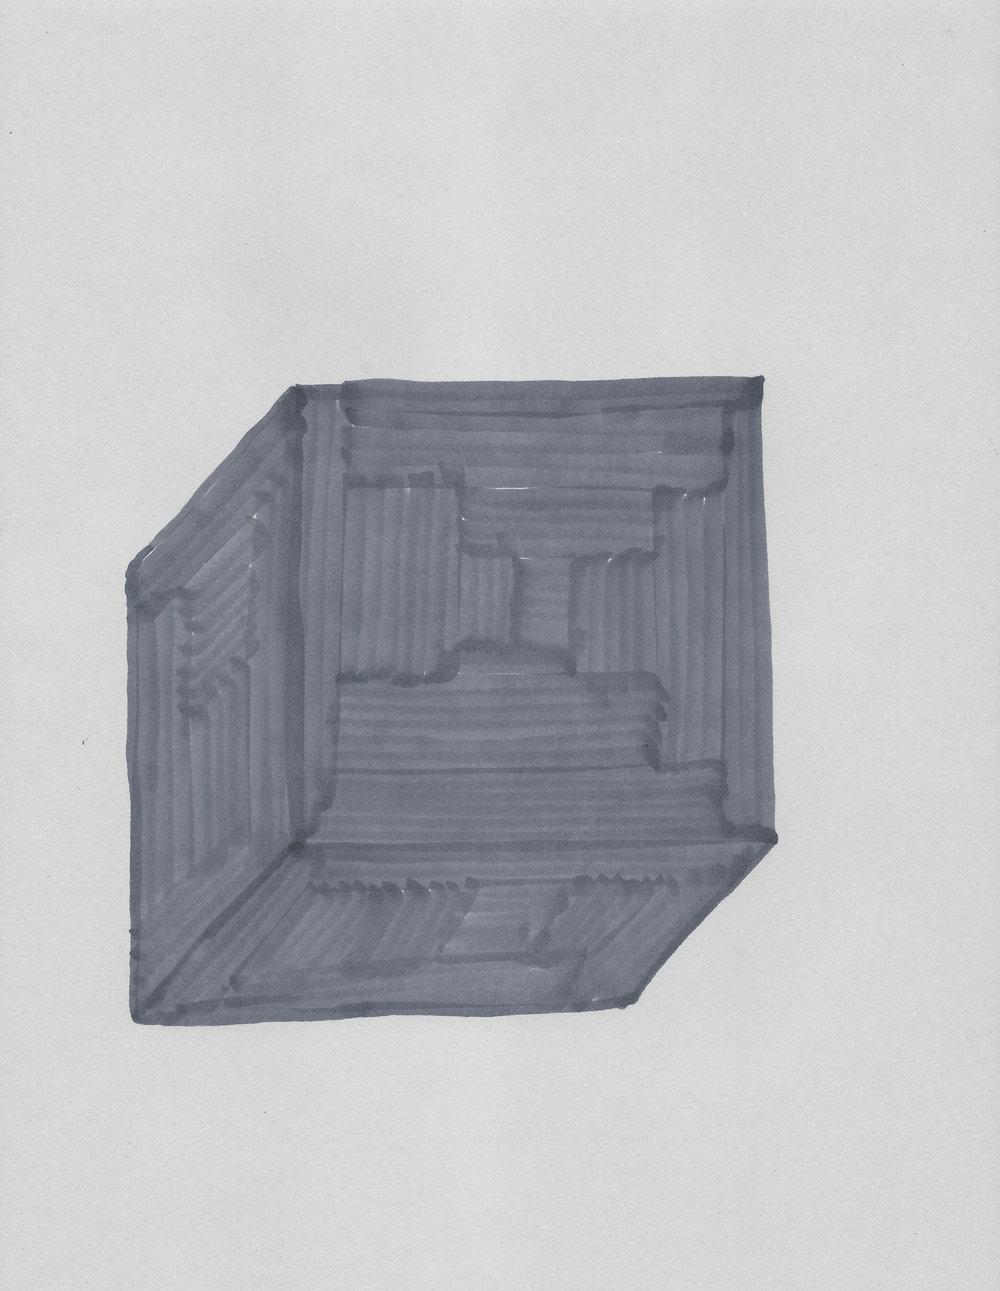 Terre des hommes  , 2017, tinta sobre papel, 28 x 22 cm.